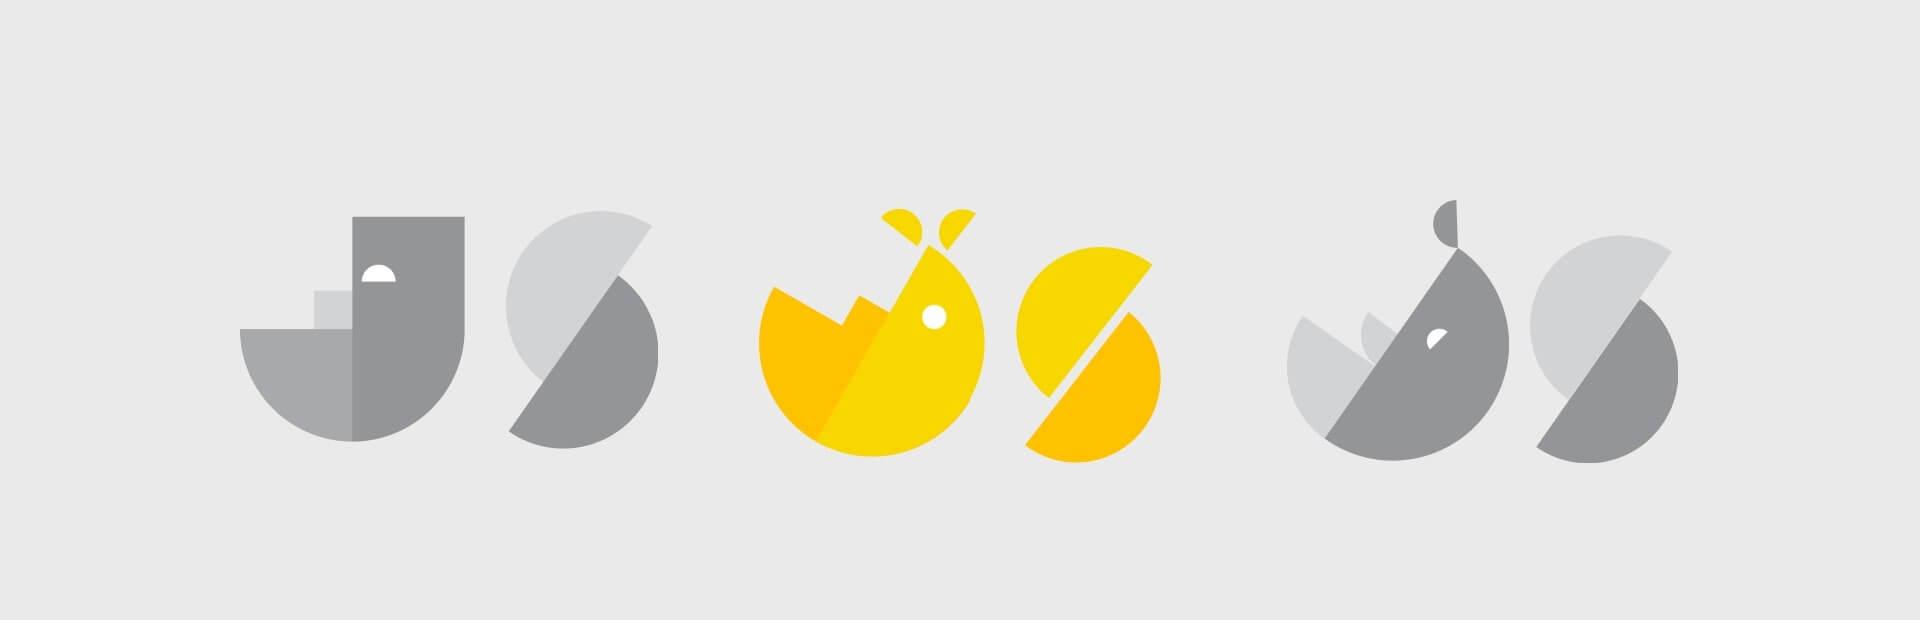 lvivjs-abstract-icons-desktop@1x